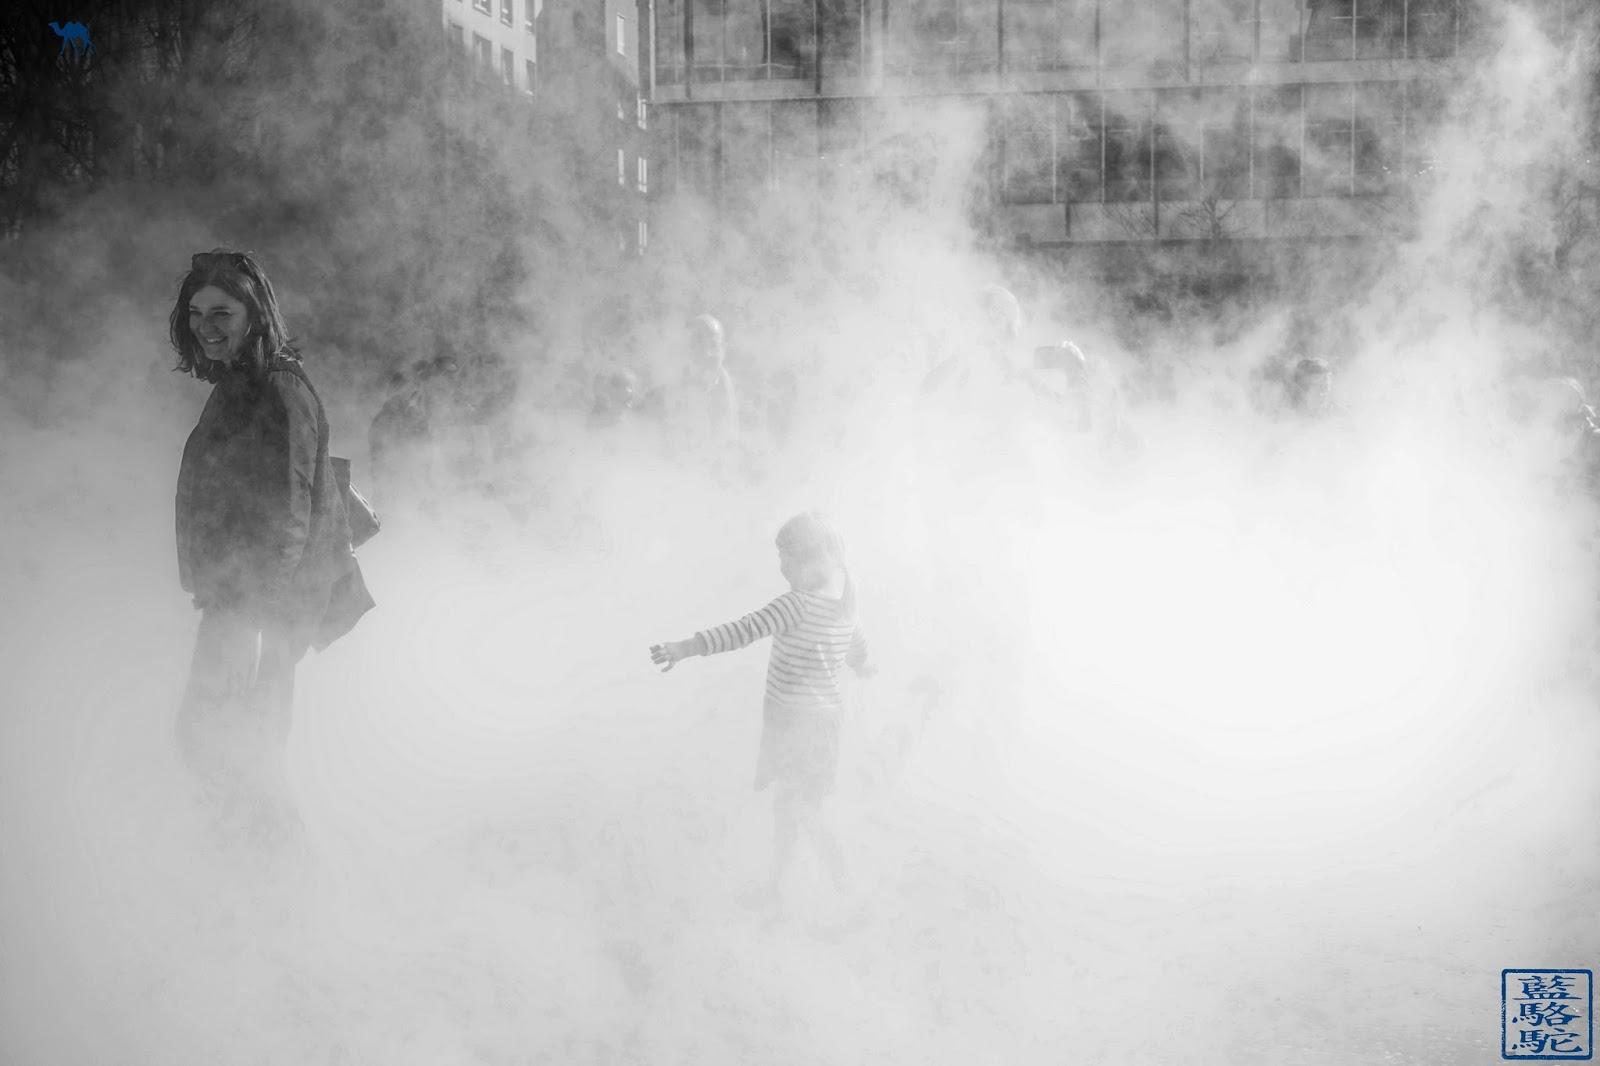 Le Chameau Bleu - Sculpture de brouillard